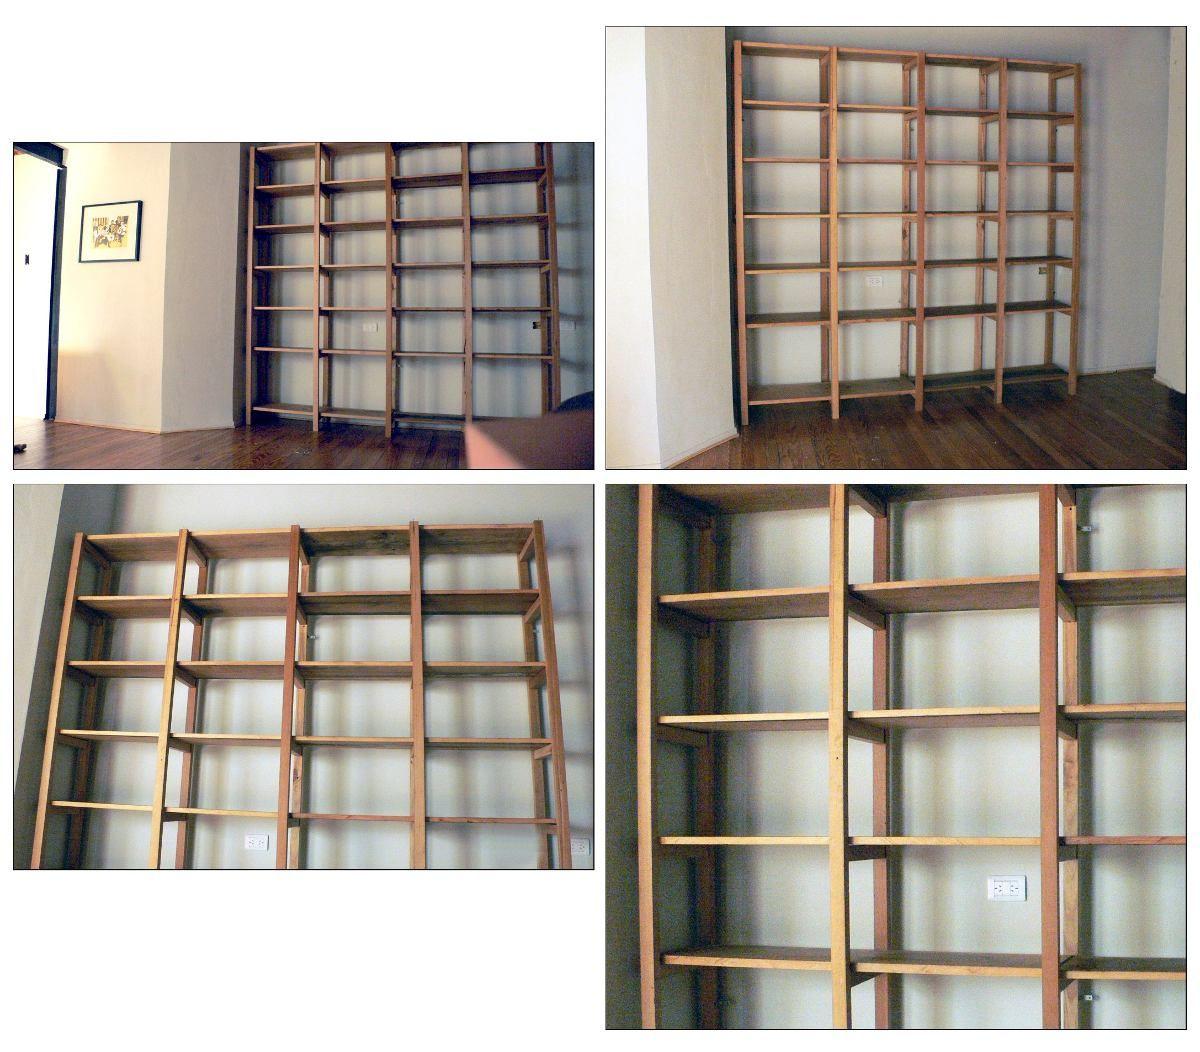 Bibliotecas estanterias a medida maderas antiguas capital federal en mercadolibre - Estanterias a medida ...